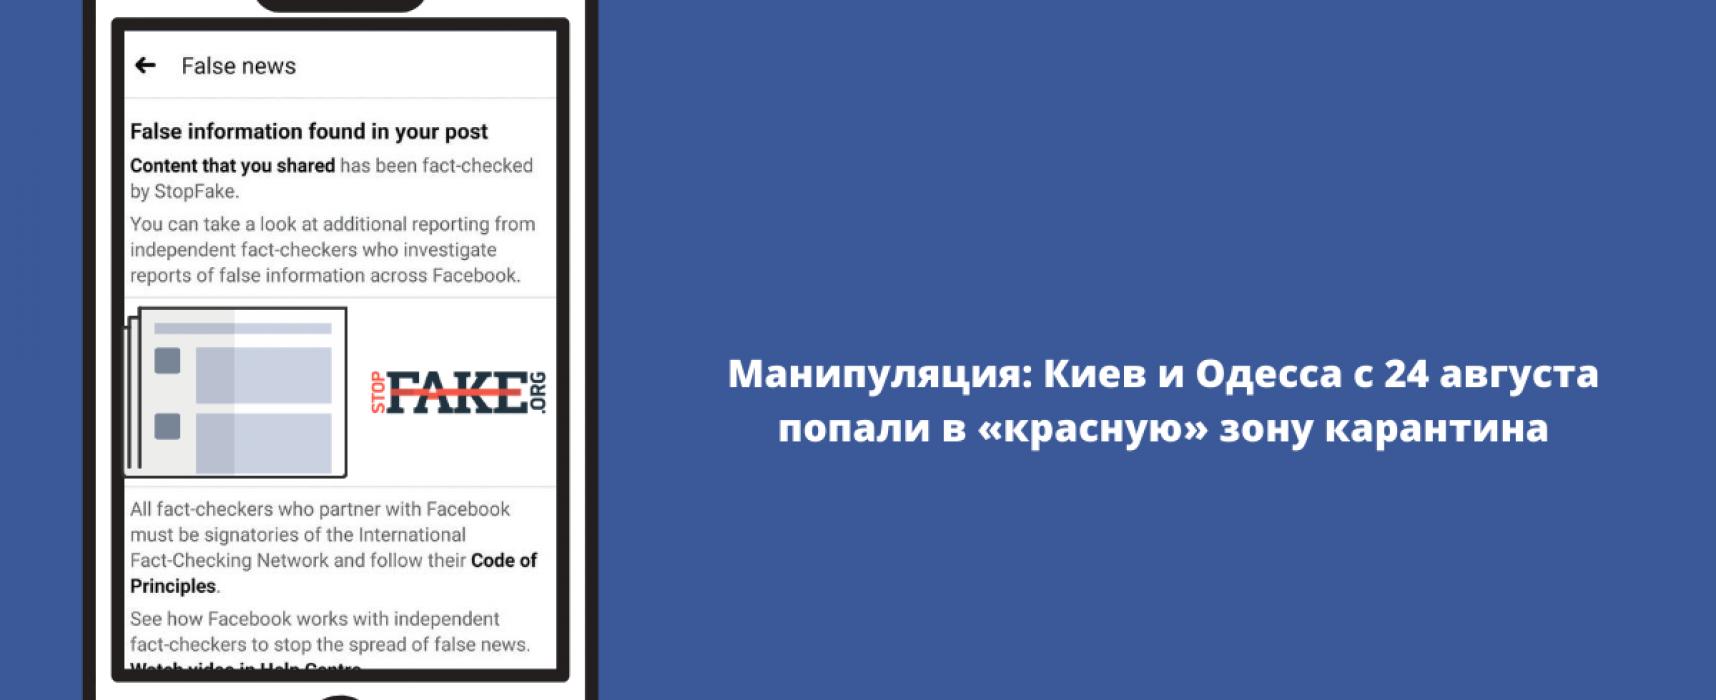 Манипуляция: Киев и Одесса с 24 августа попали в «красную» зону карантина